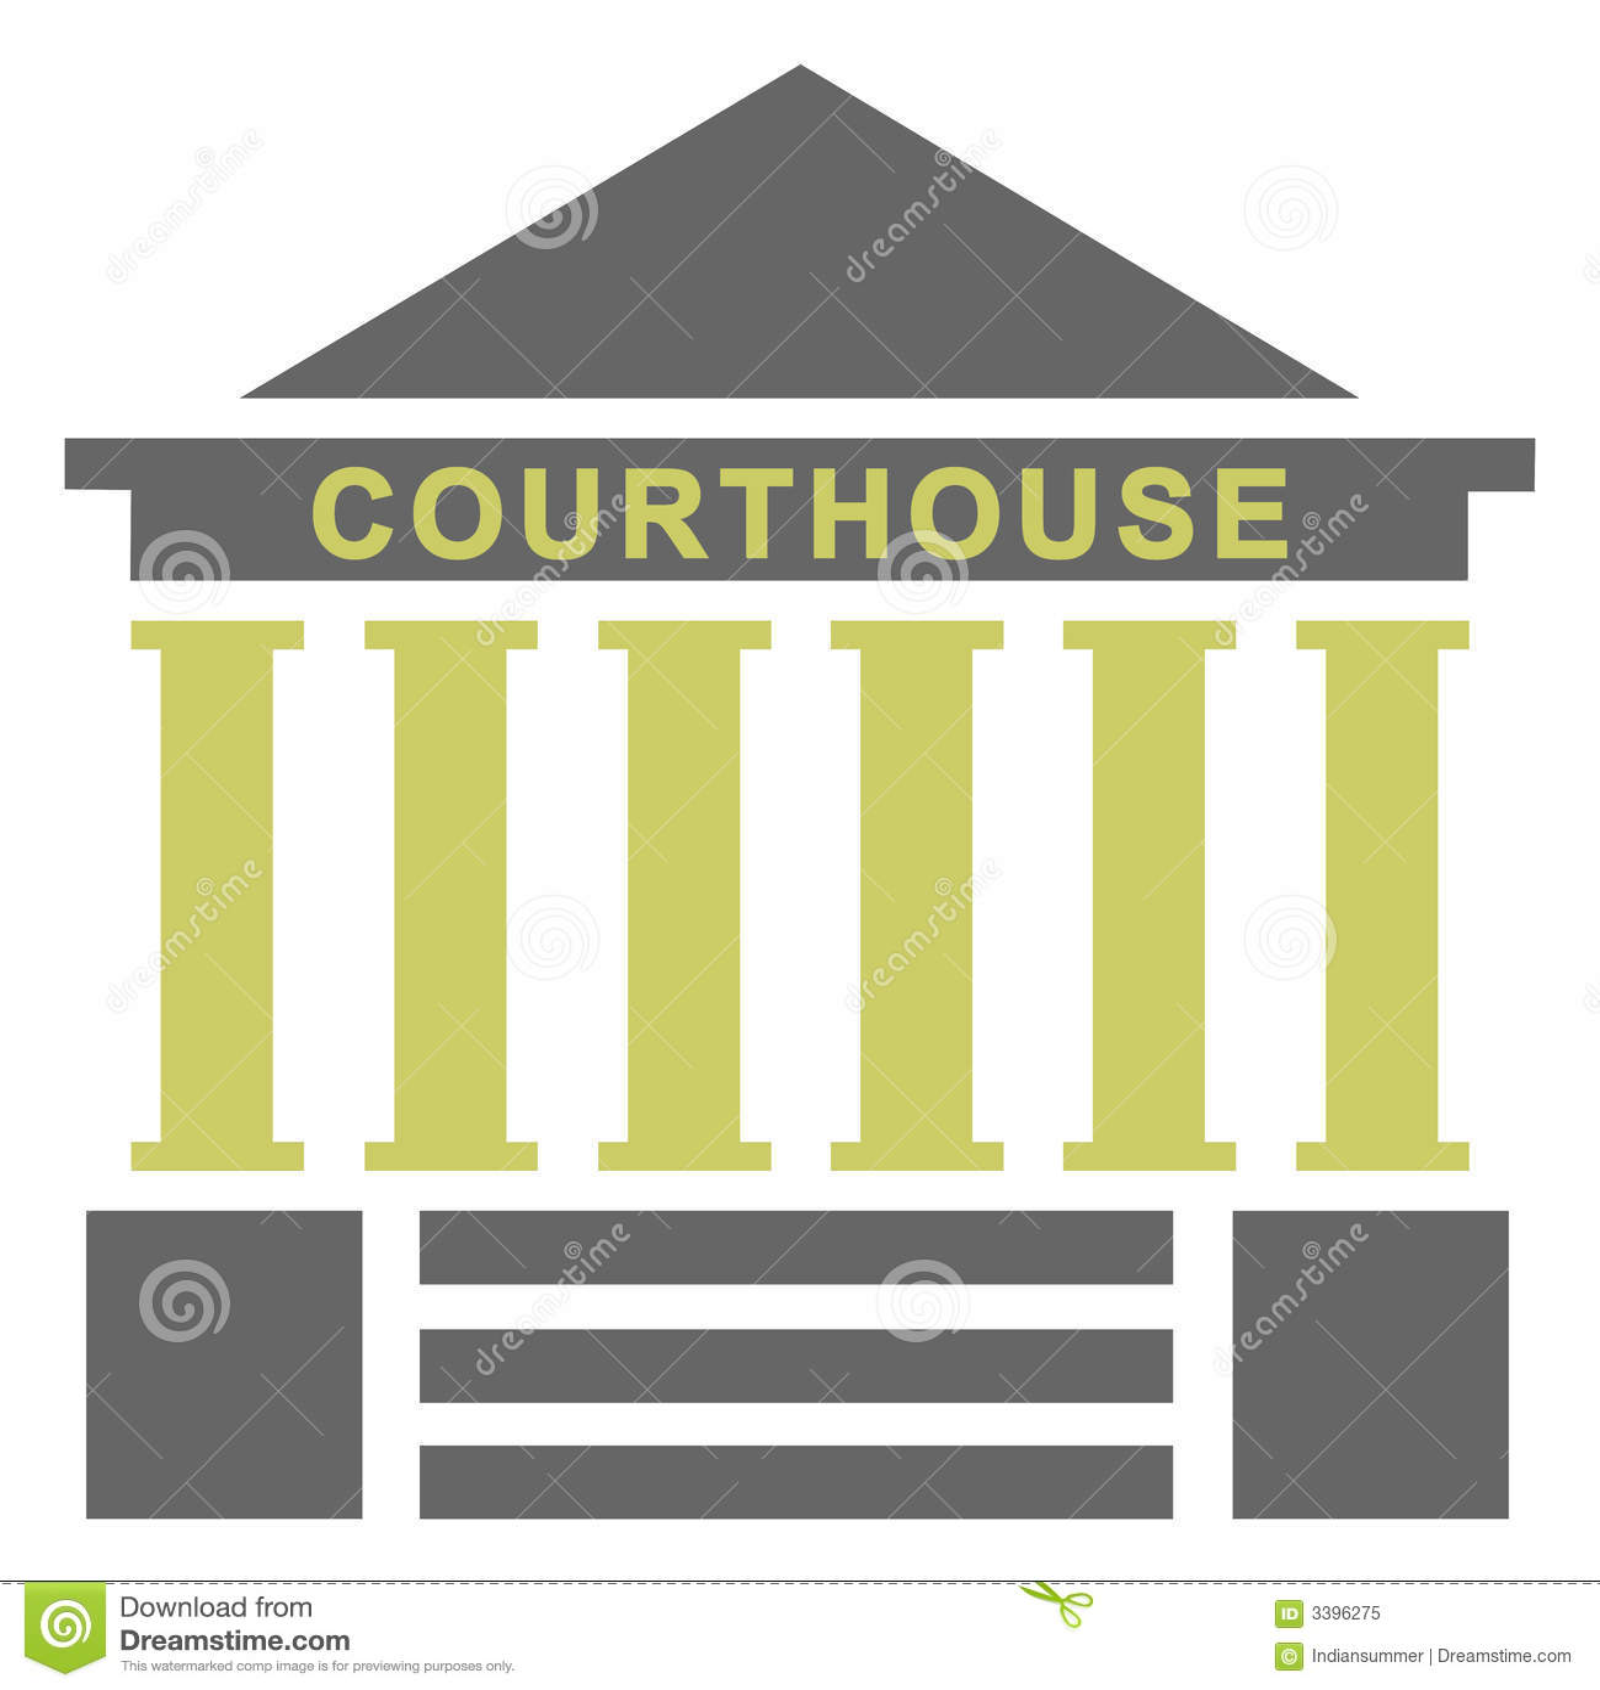 иллюстрация здания суда